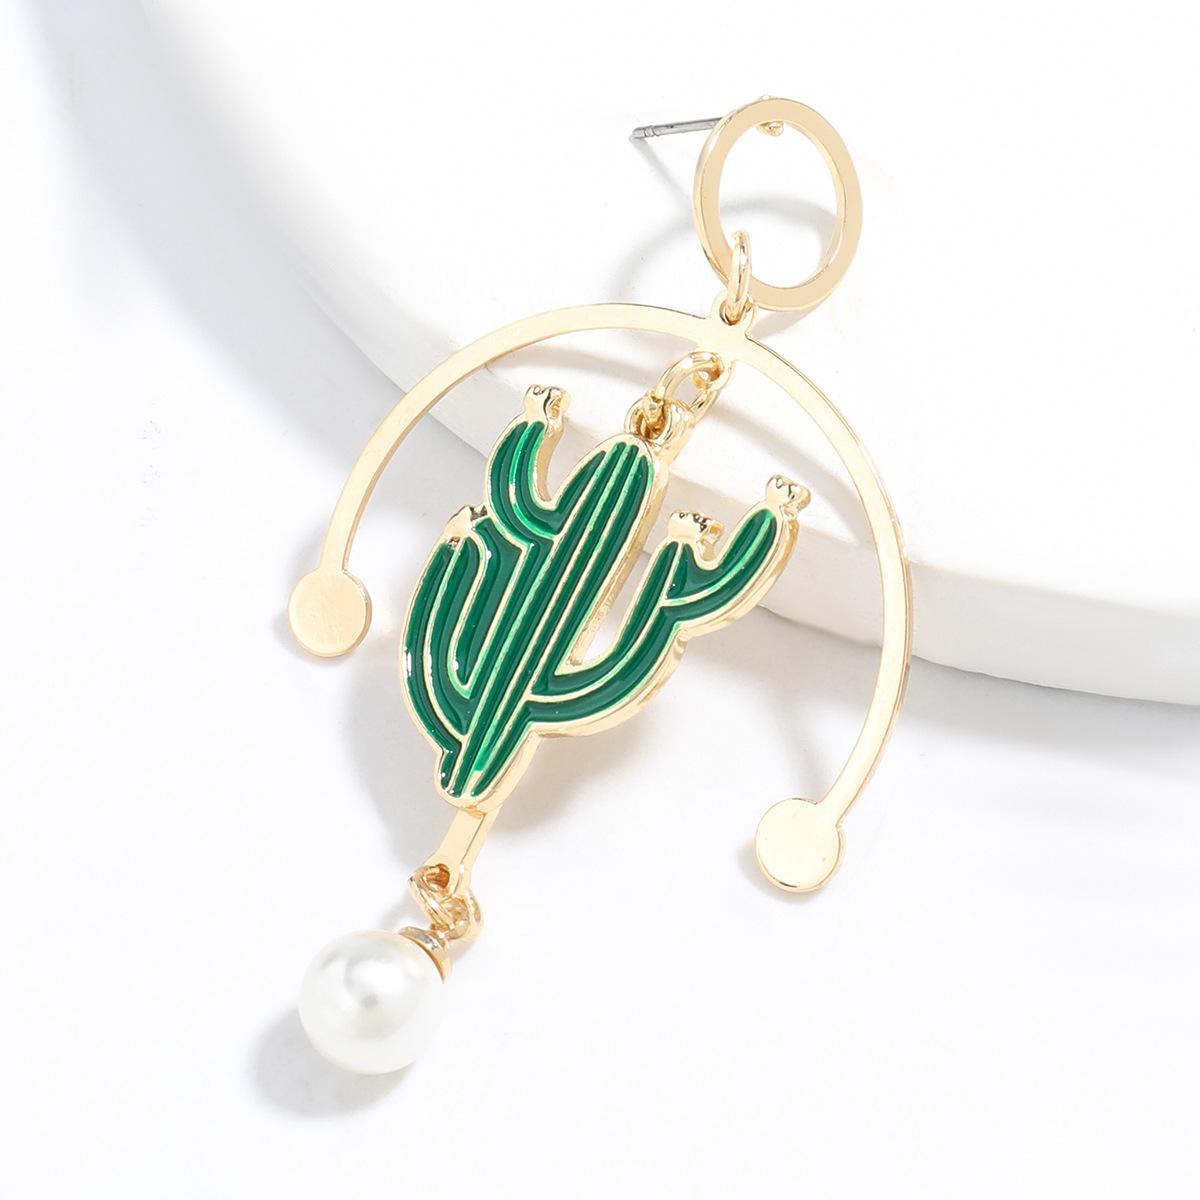 design sense creative alloy drop oil inlaid pearl cactus earrings wholesale NHJE248101